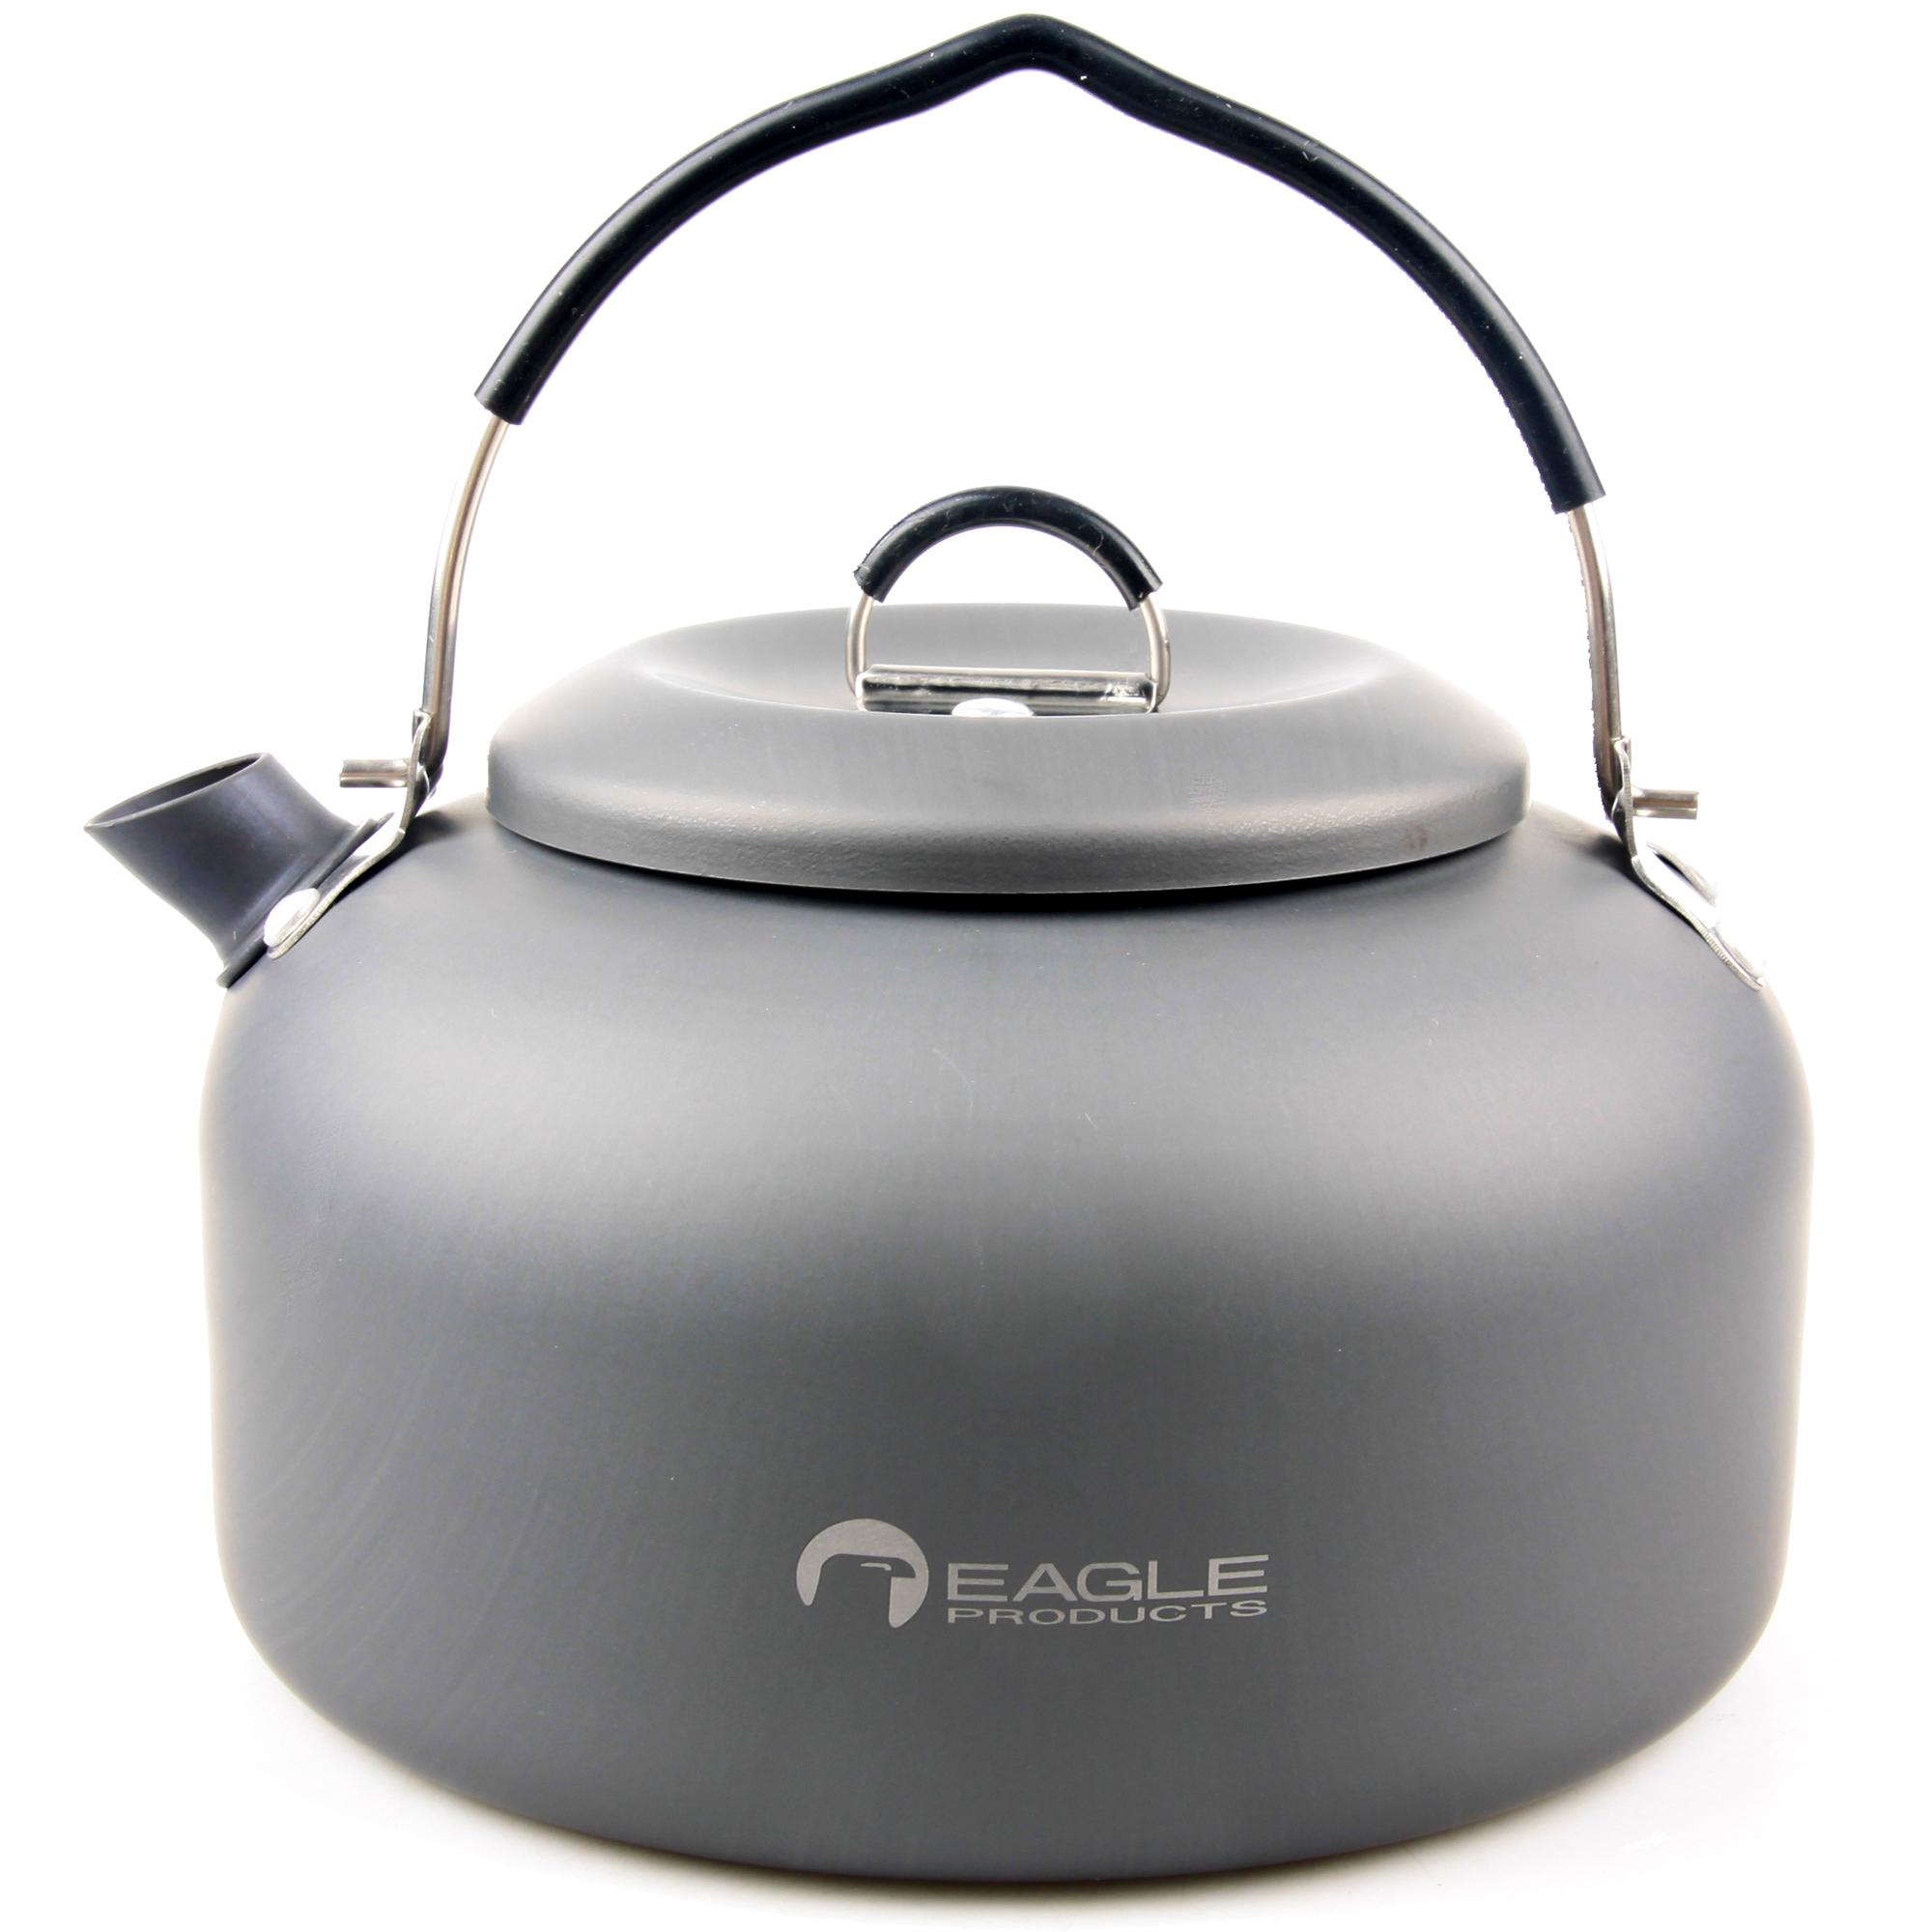 EAGLE Products(イーグルプロダクツ)/Kaffekjele 1.4L anodisert